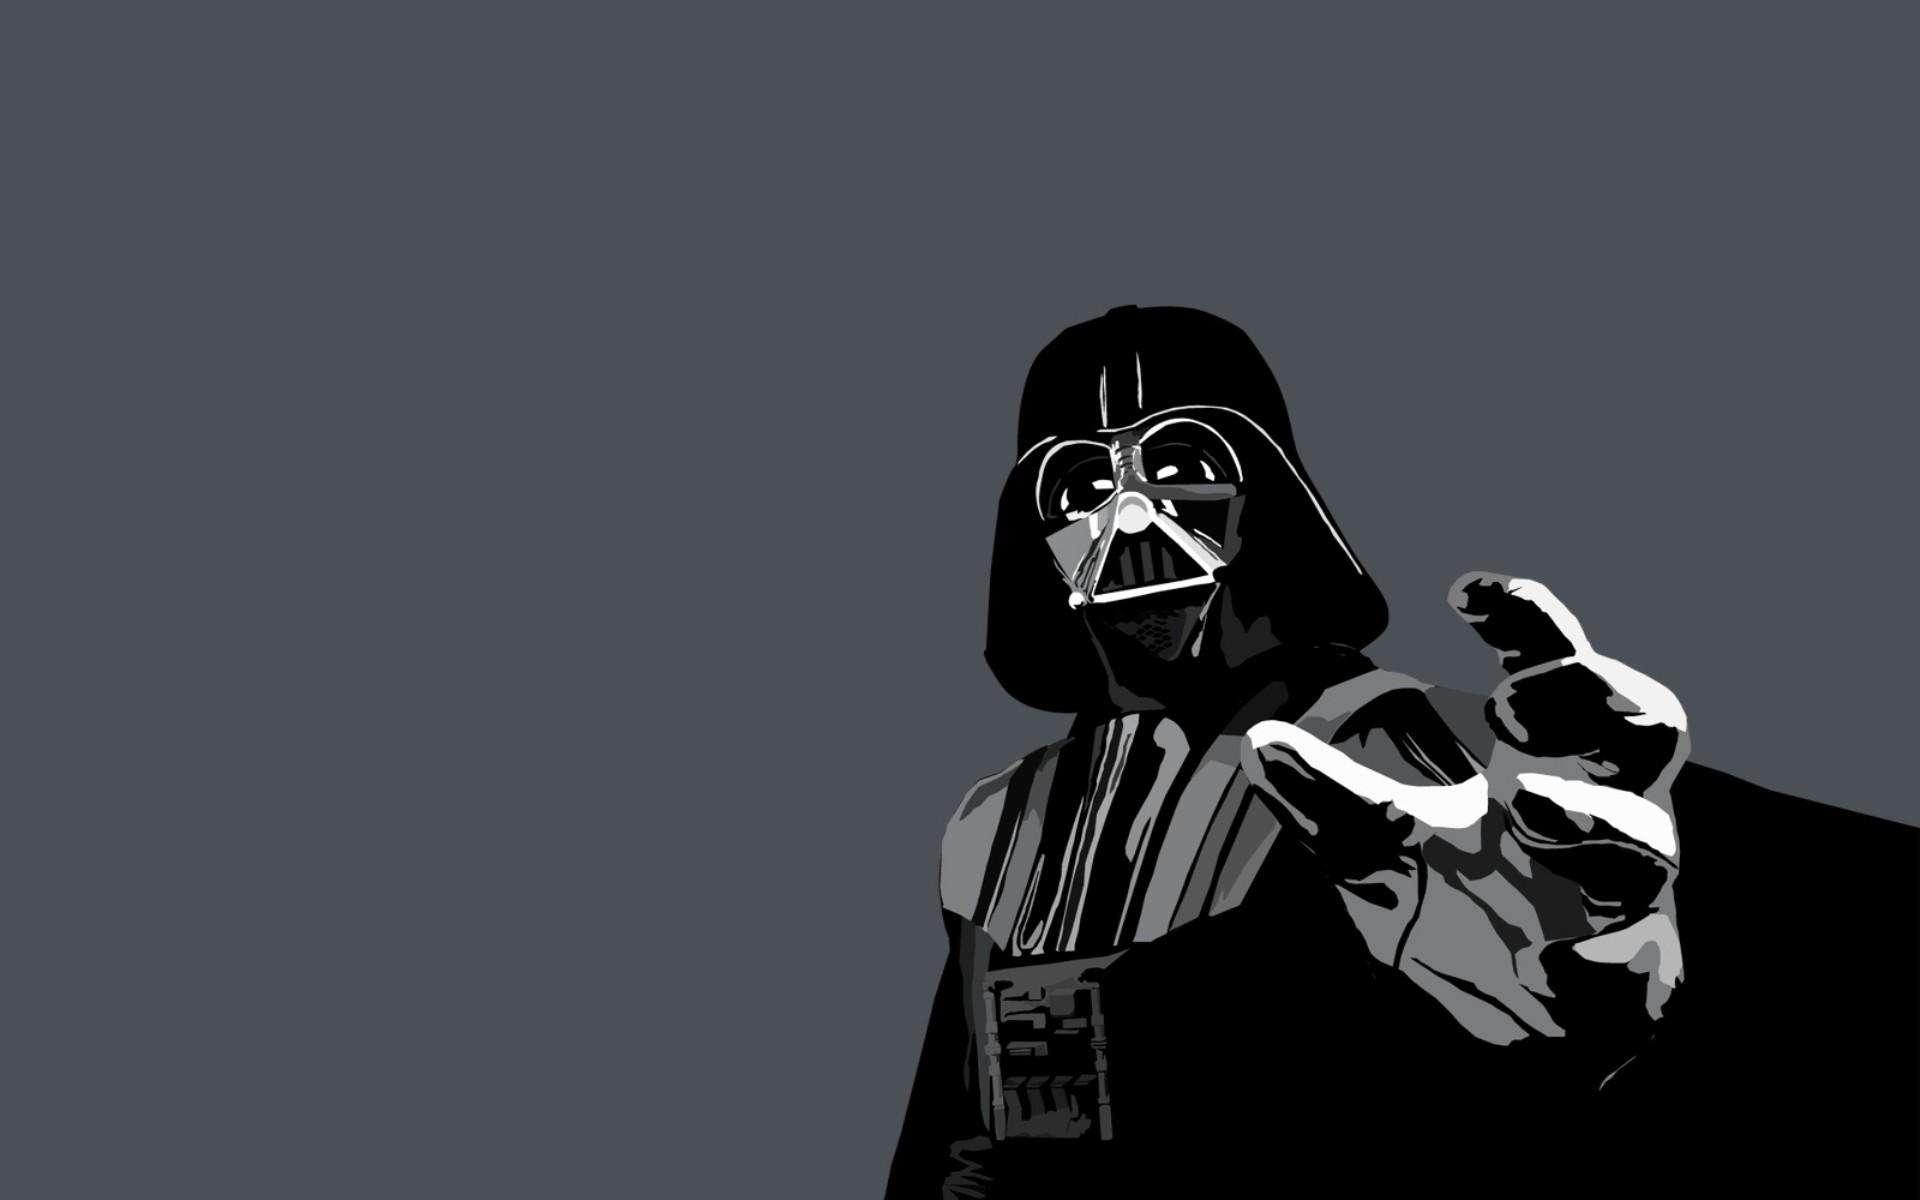 Star Wars Wallpaper 099